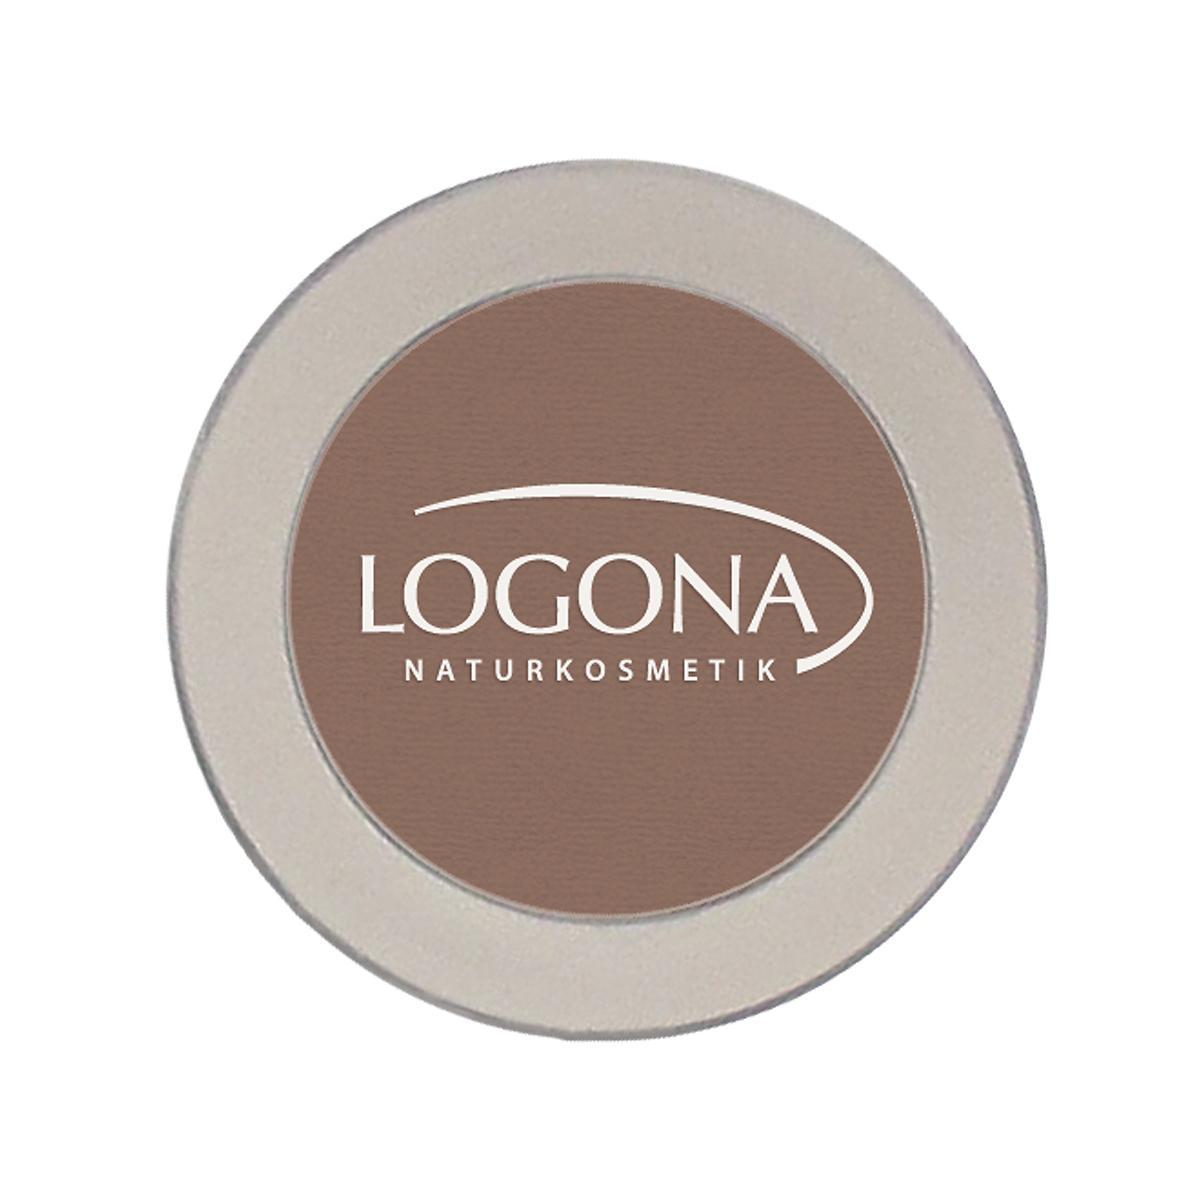 Logona Oční stíny mono 02 čokoláda 2 g